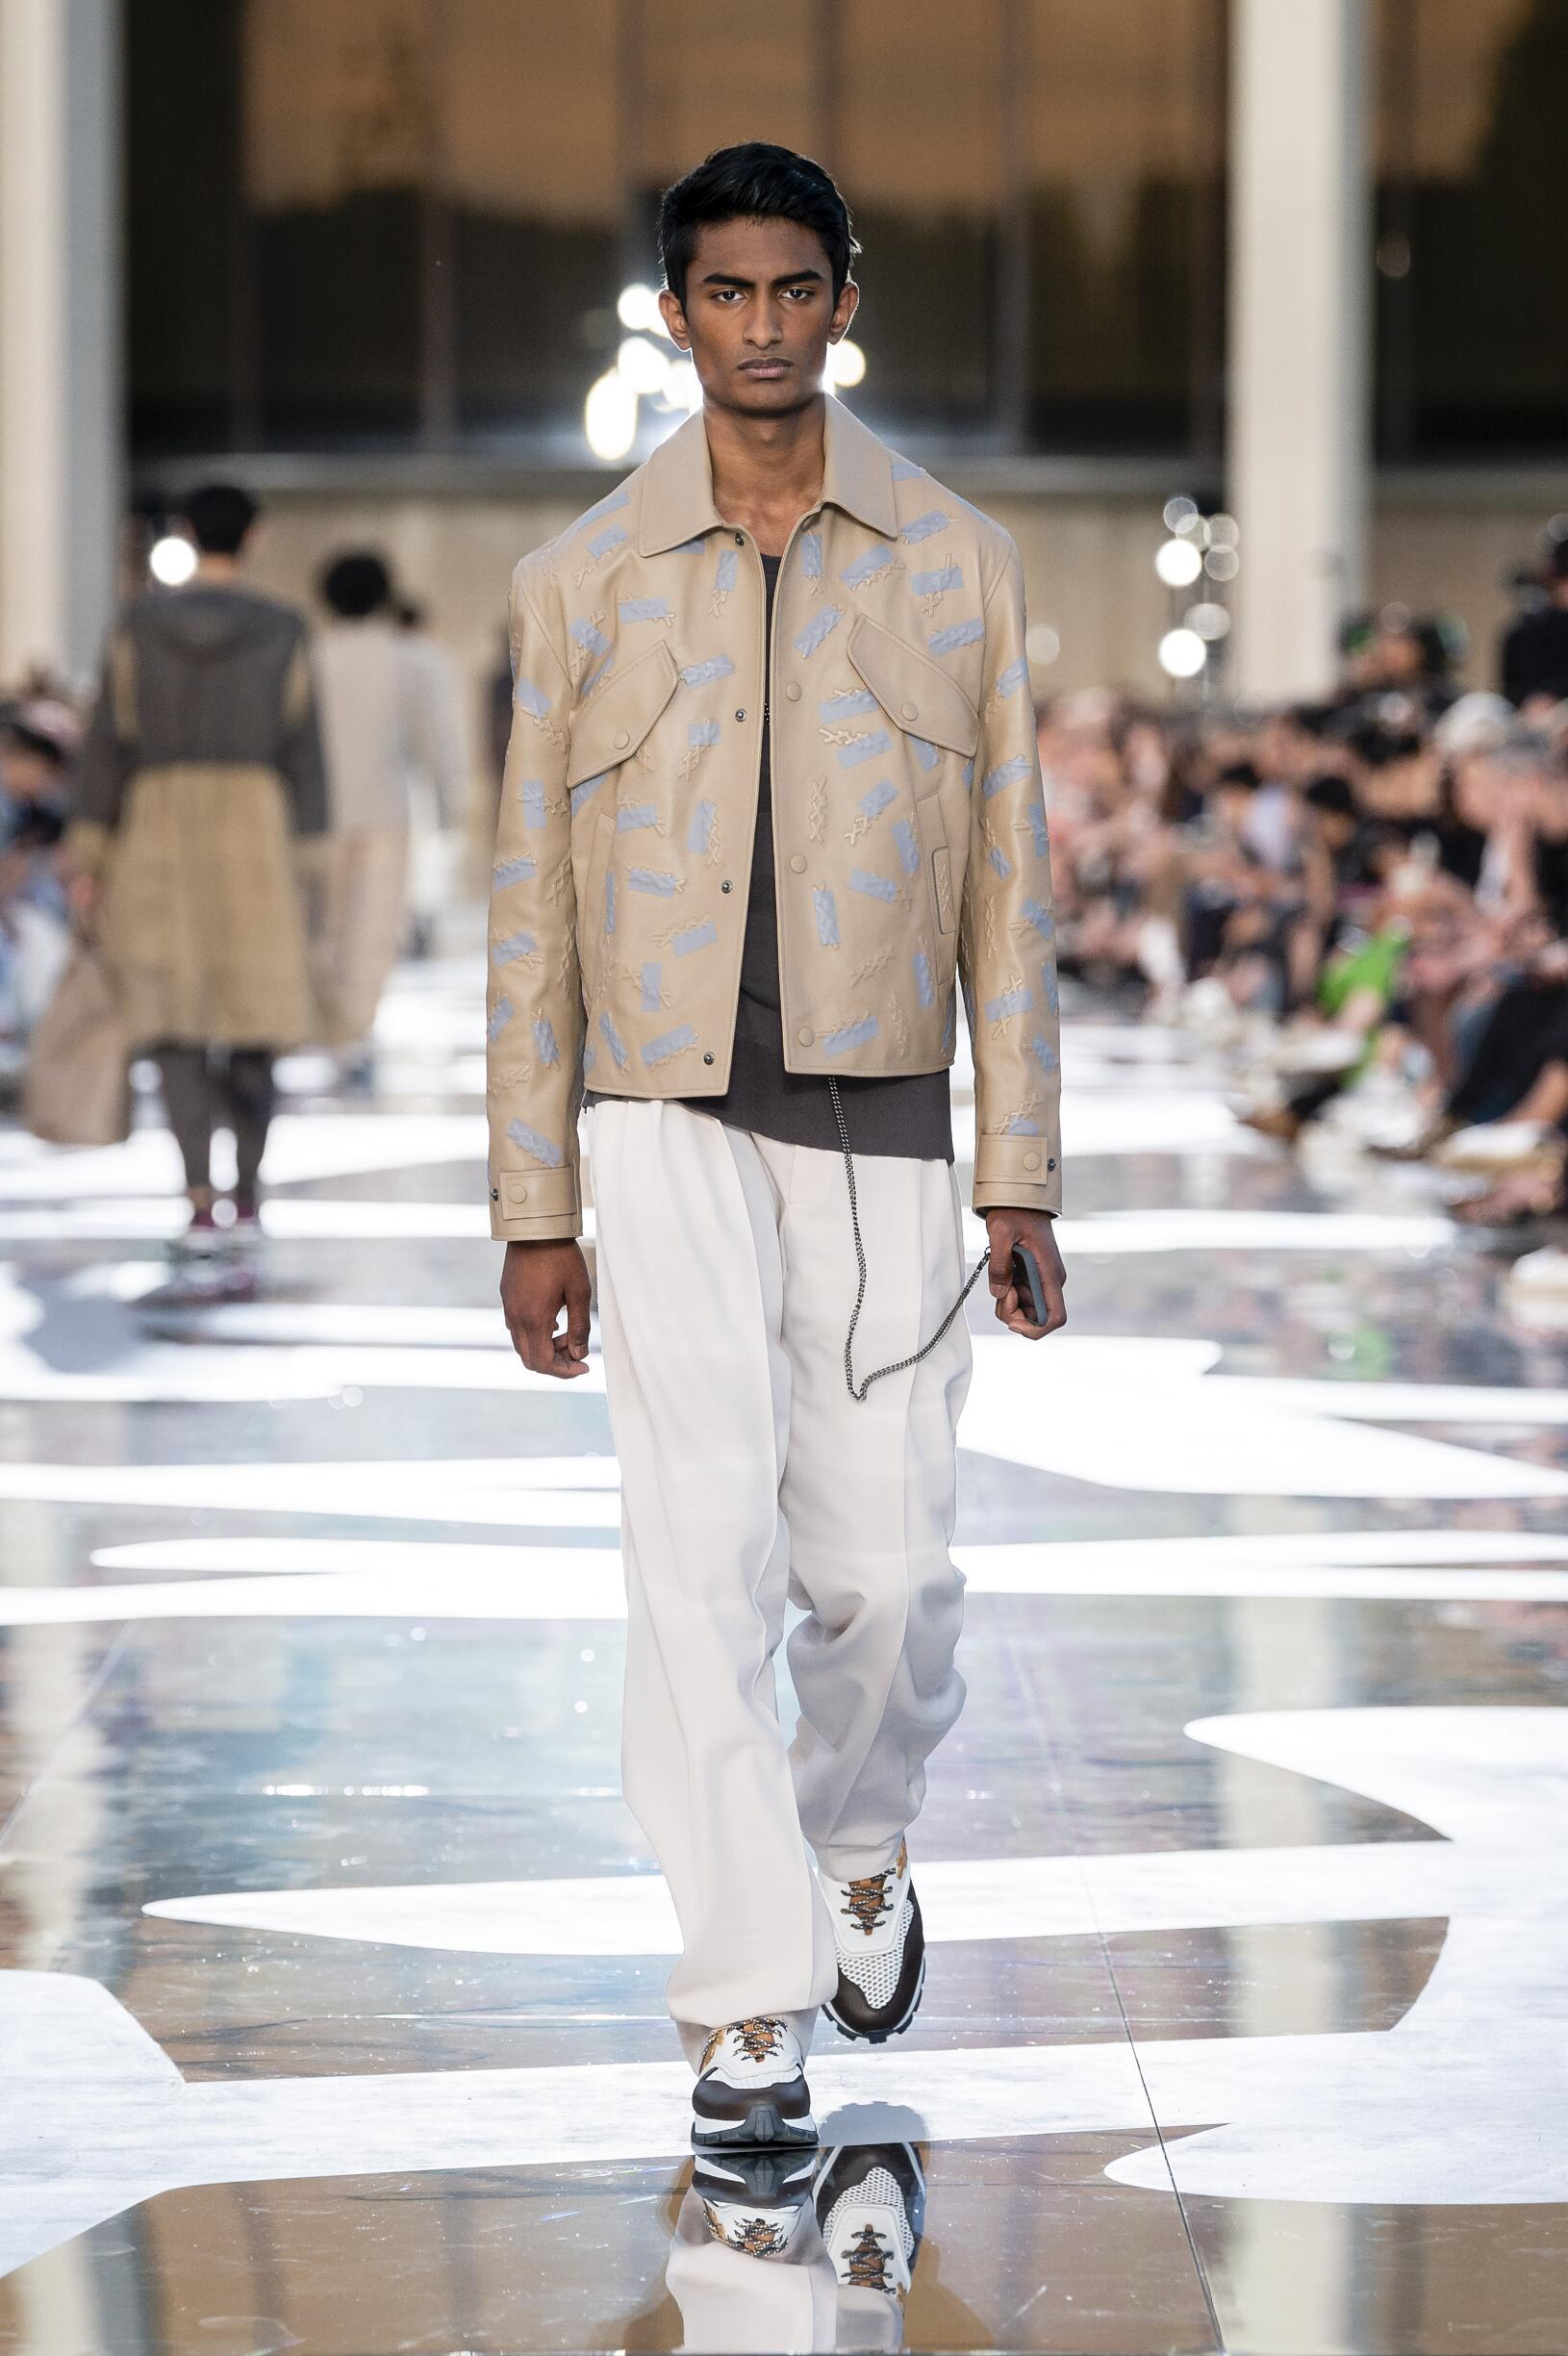 Ermenegildo Zegna Couture SS 2019 Menswear